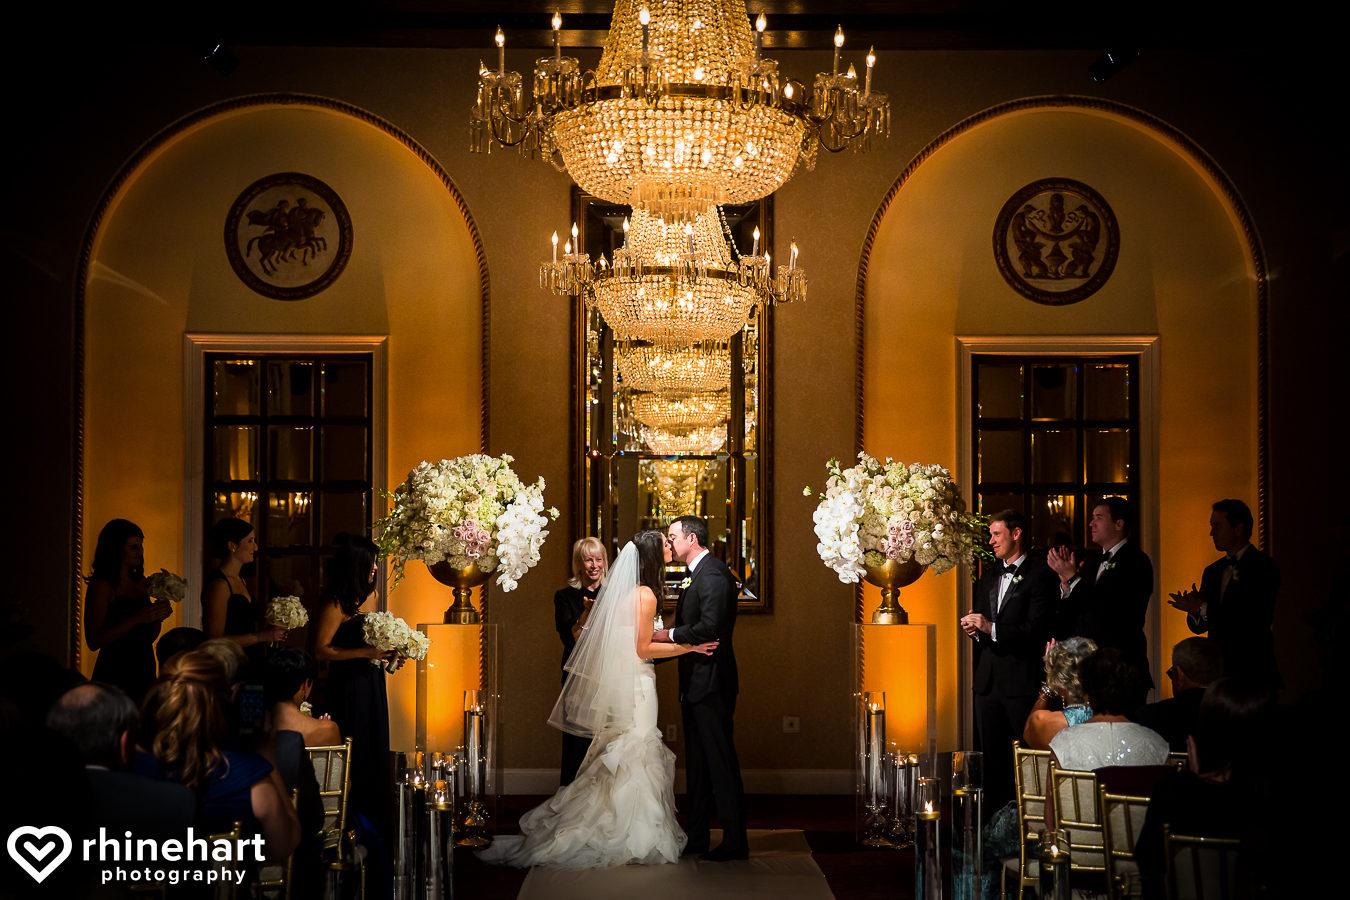 creative-unique-artistic-best-top-colorful-vibrant-emotional-pa-wedding-photographers-4